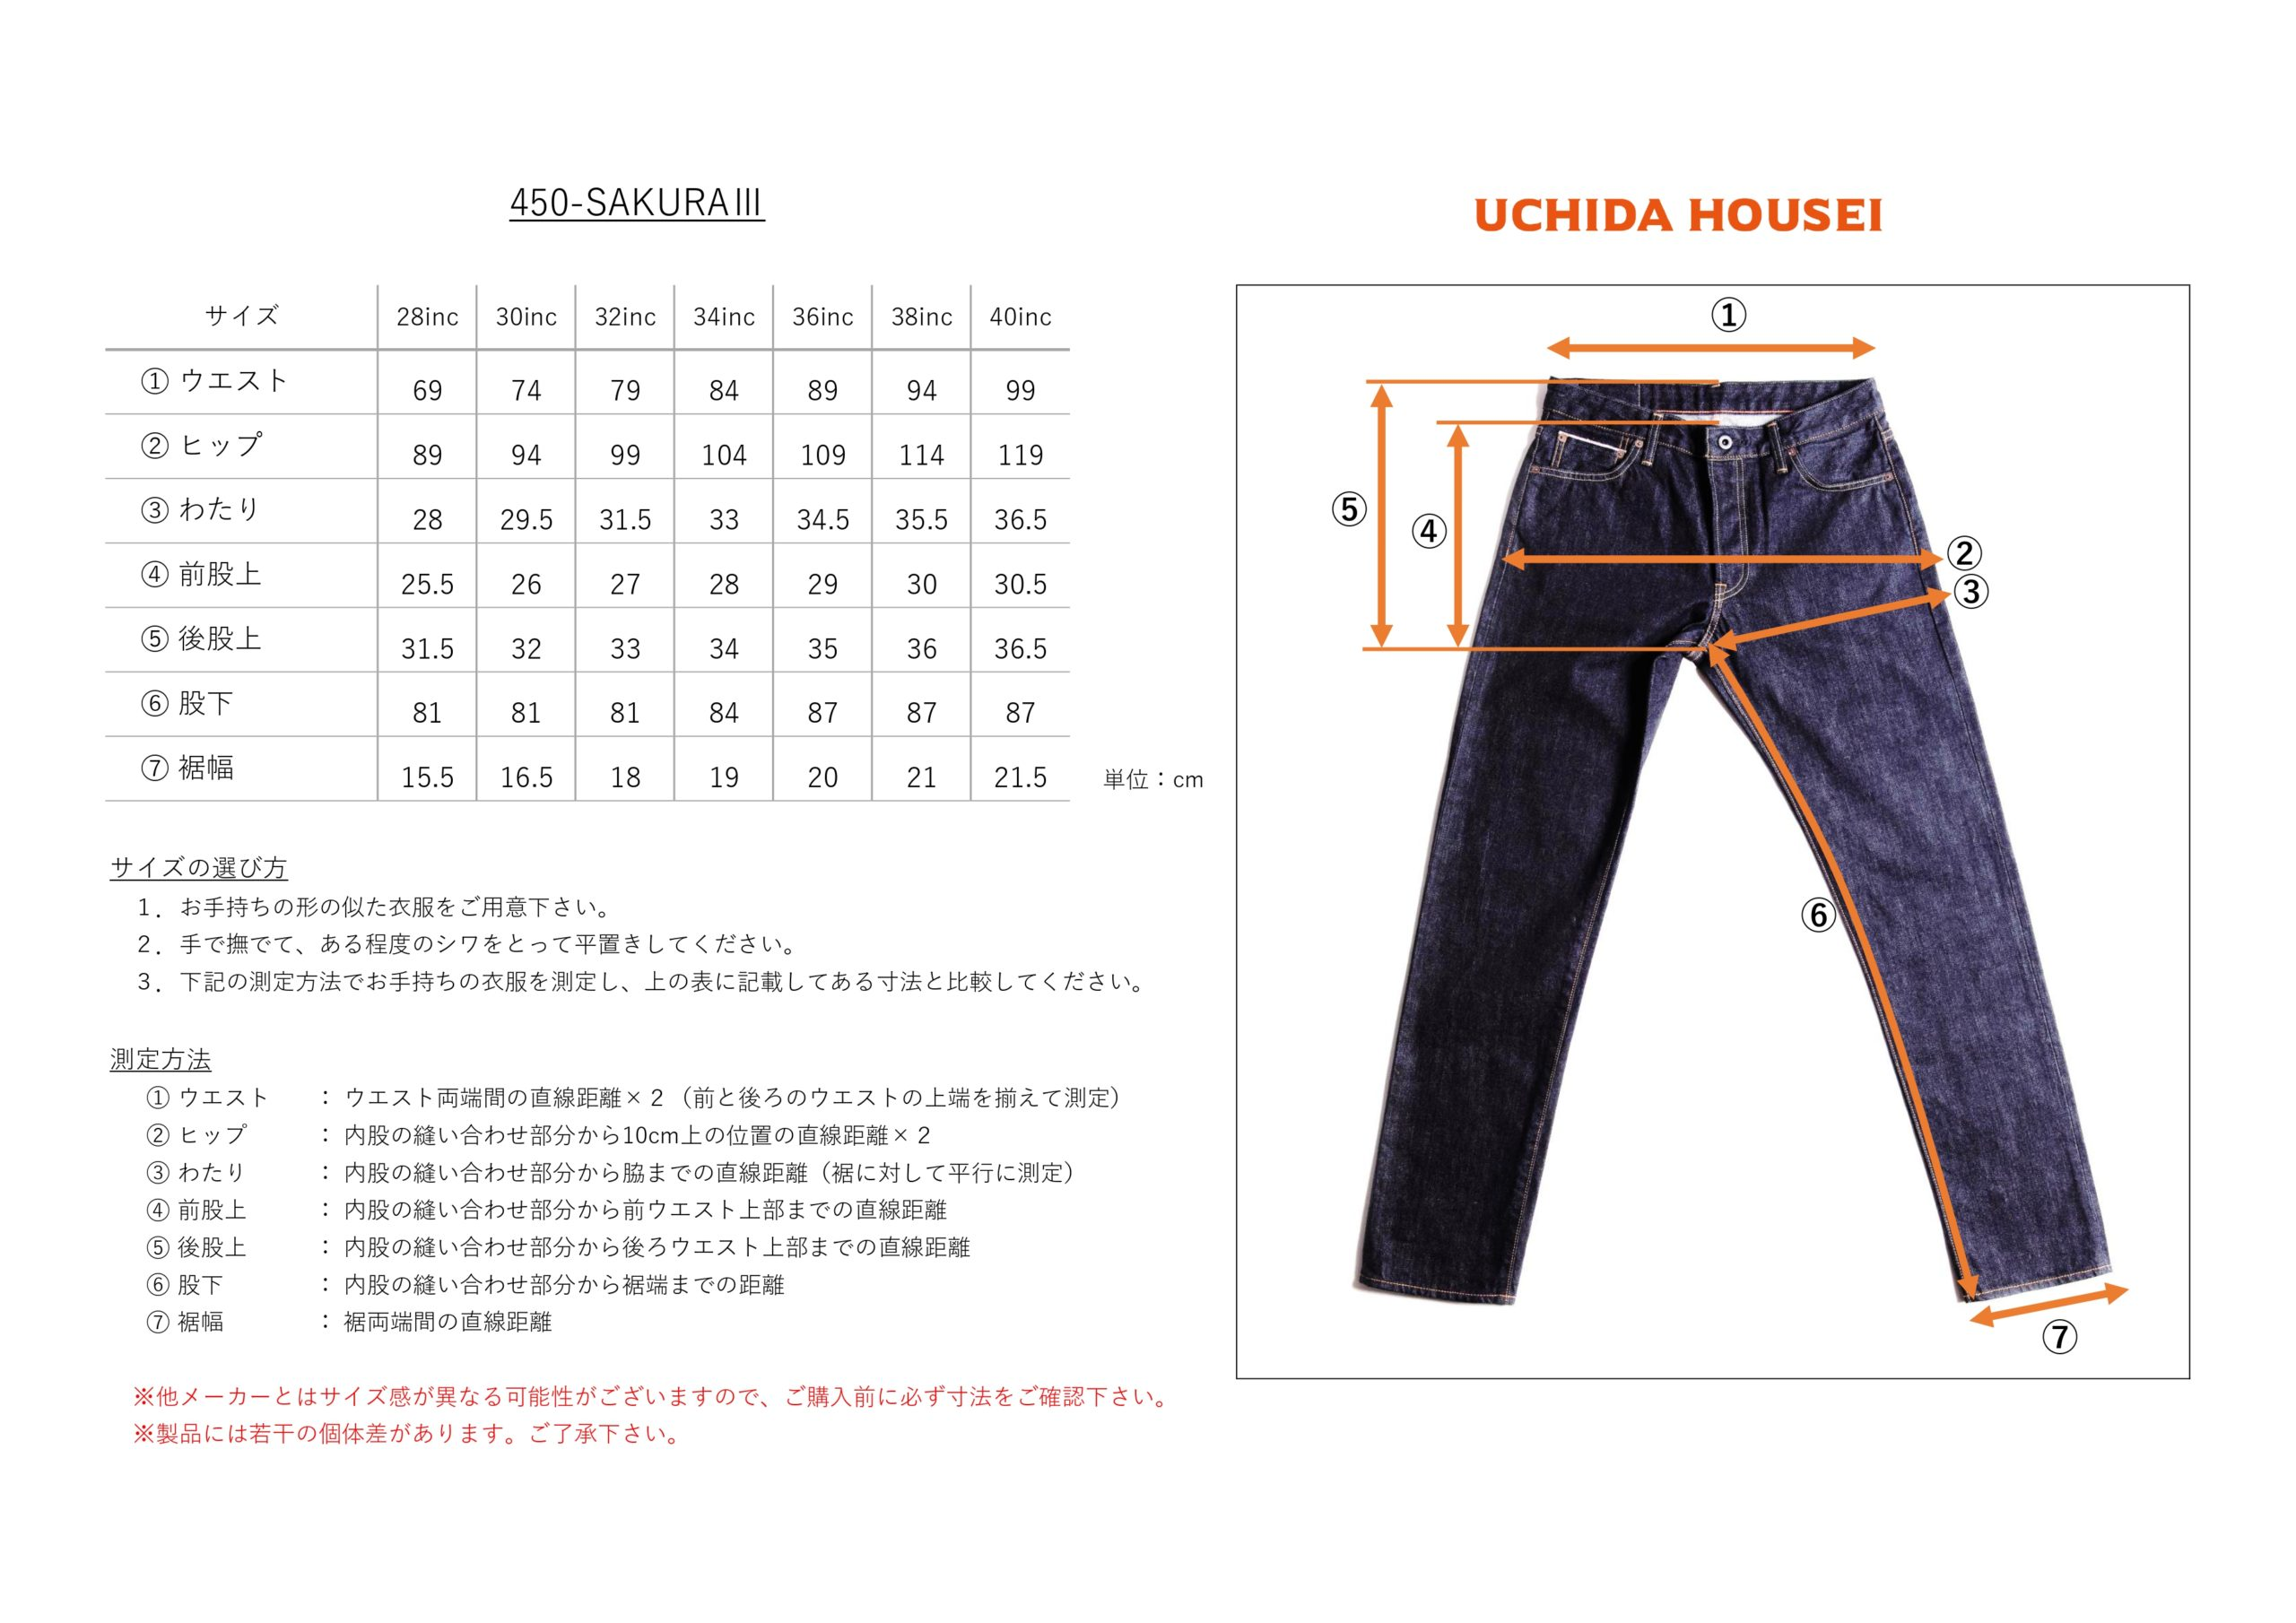 450-SAKURAⅢ【さくらⅢ】